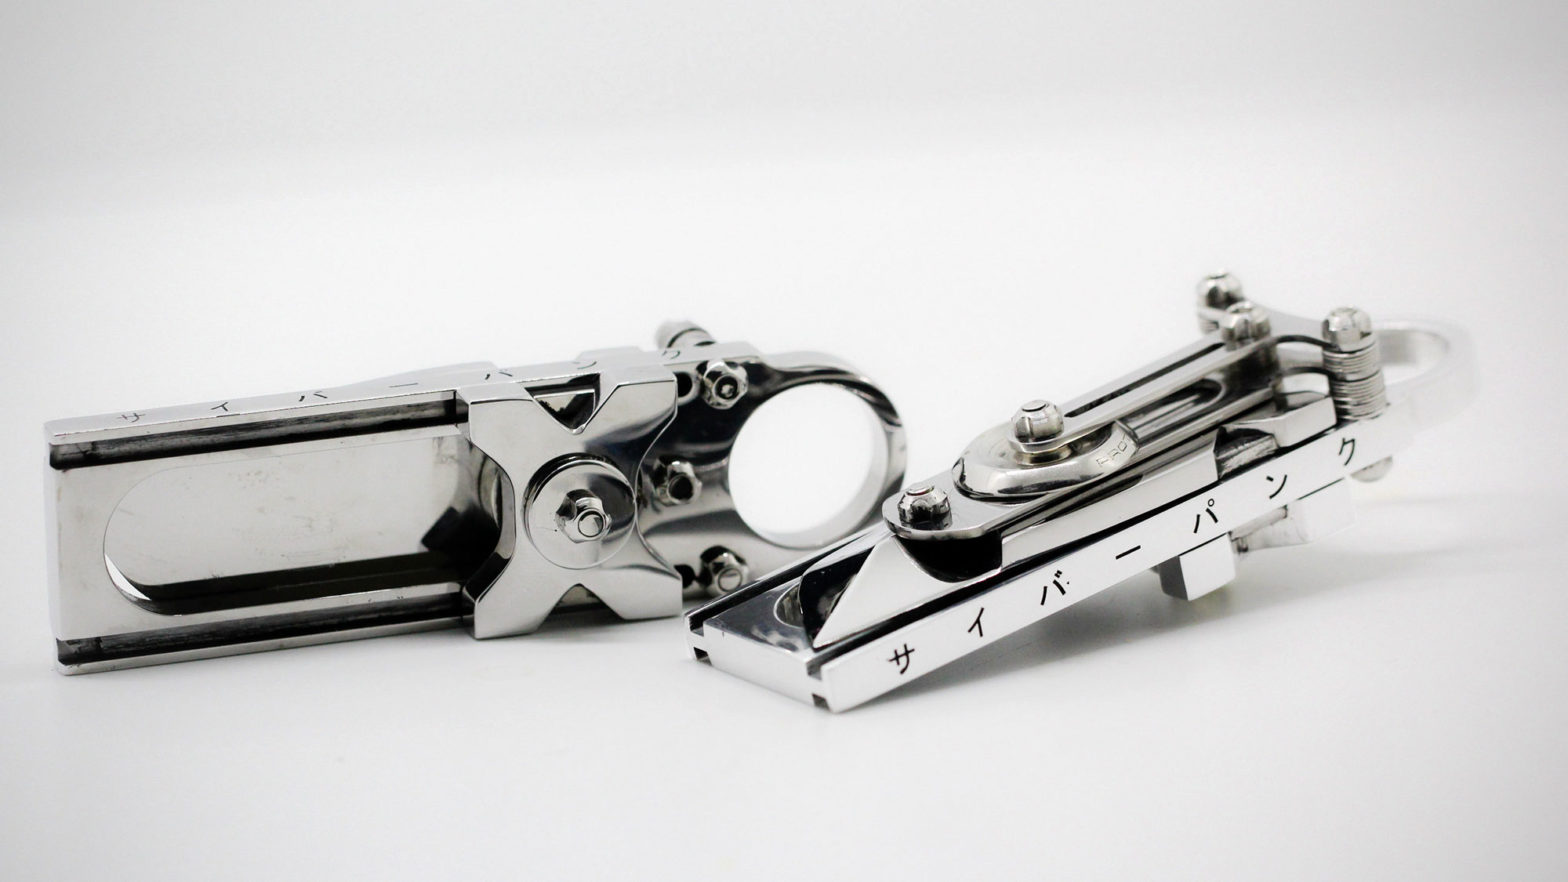 Inertix Cyberpunk Pocket Exoblade Knife